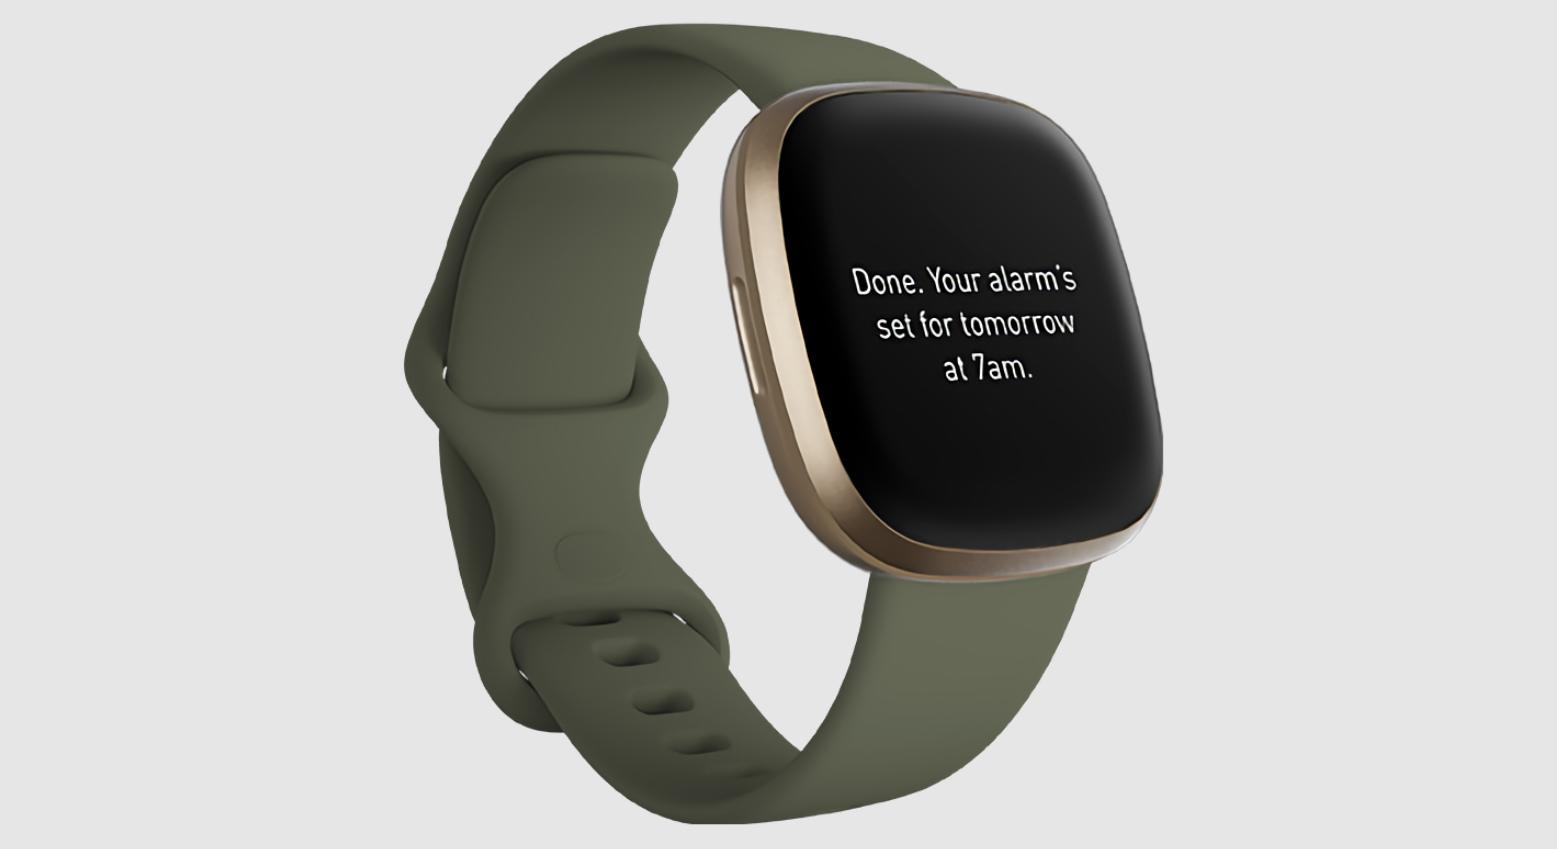 Fitbit Sense and Versa 3 updates make Google Assistant speak on your wrist